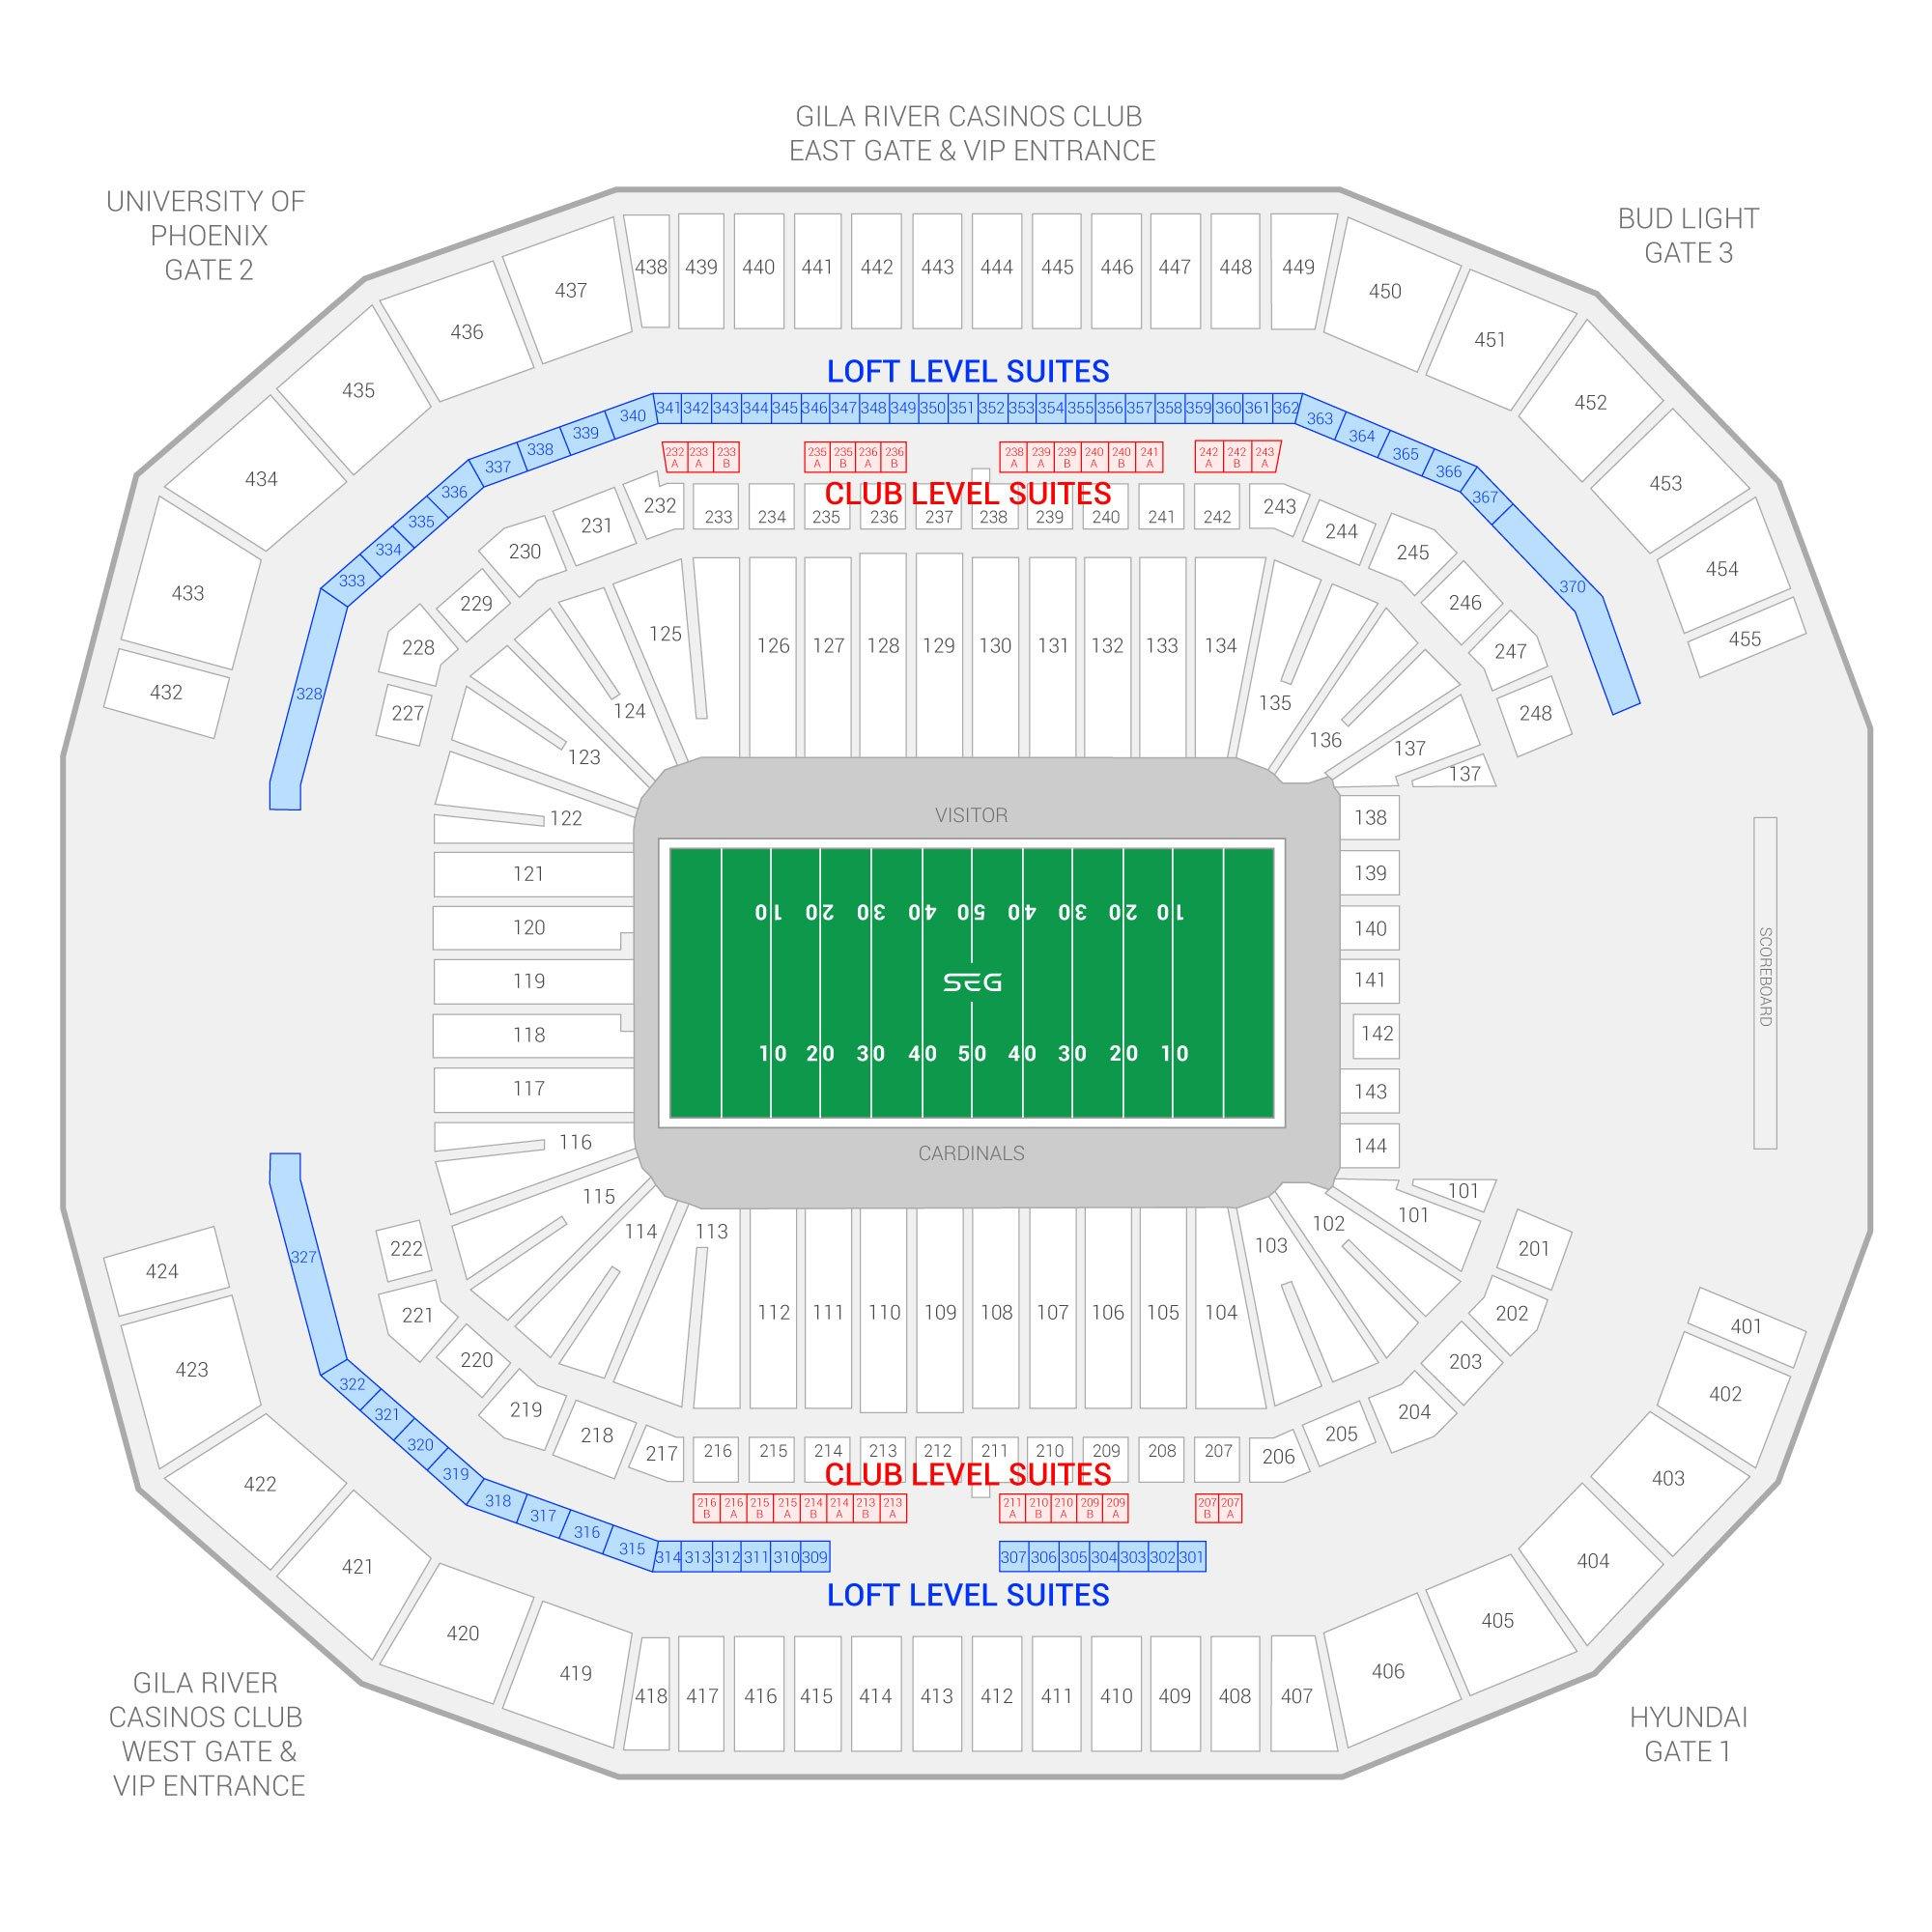 State Farm Stadium / Arizona Cardinals Suite Map and Seating Chart